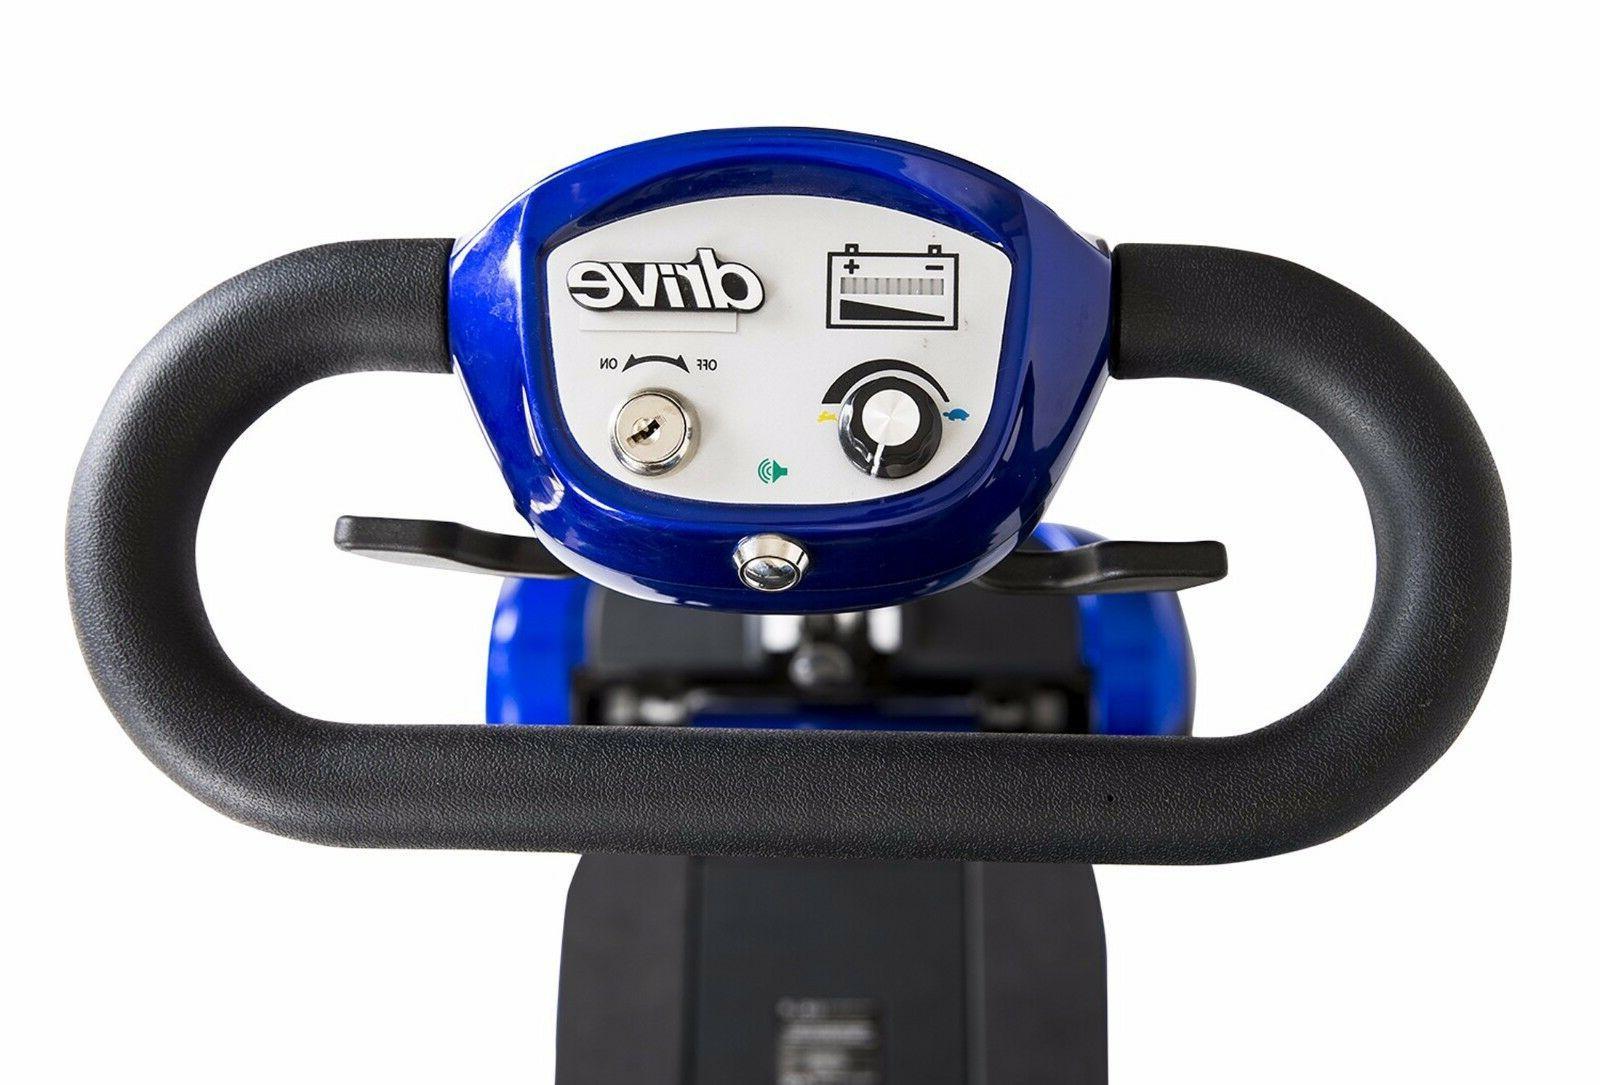 Drive Self-Folding 4 Wheel Scooter, 300 lb Capacity